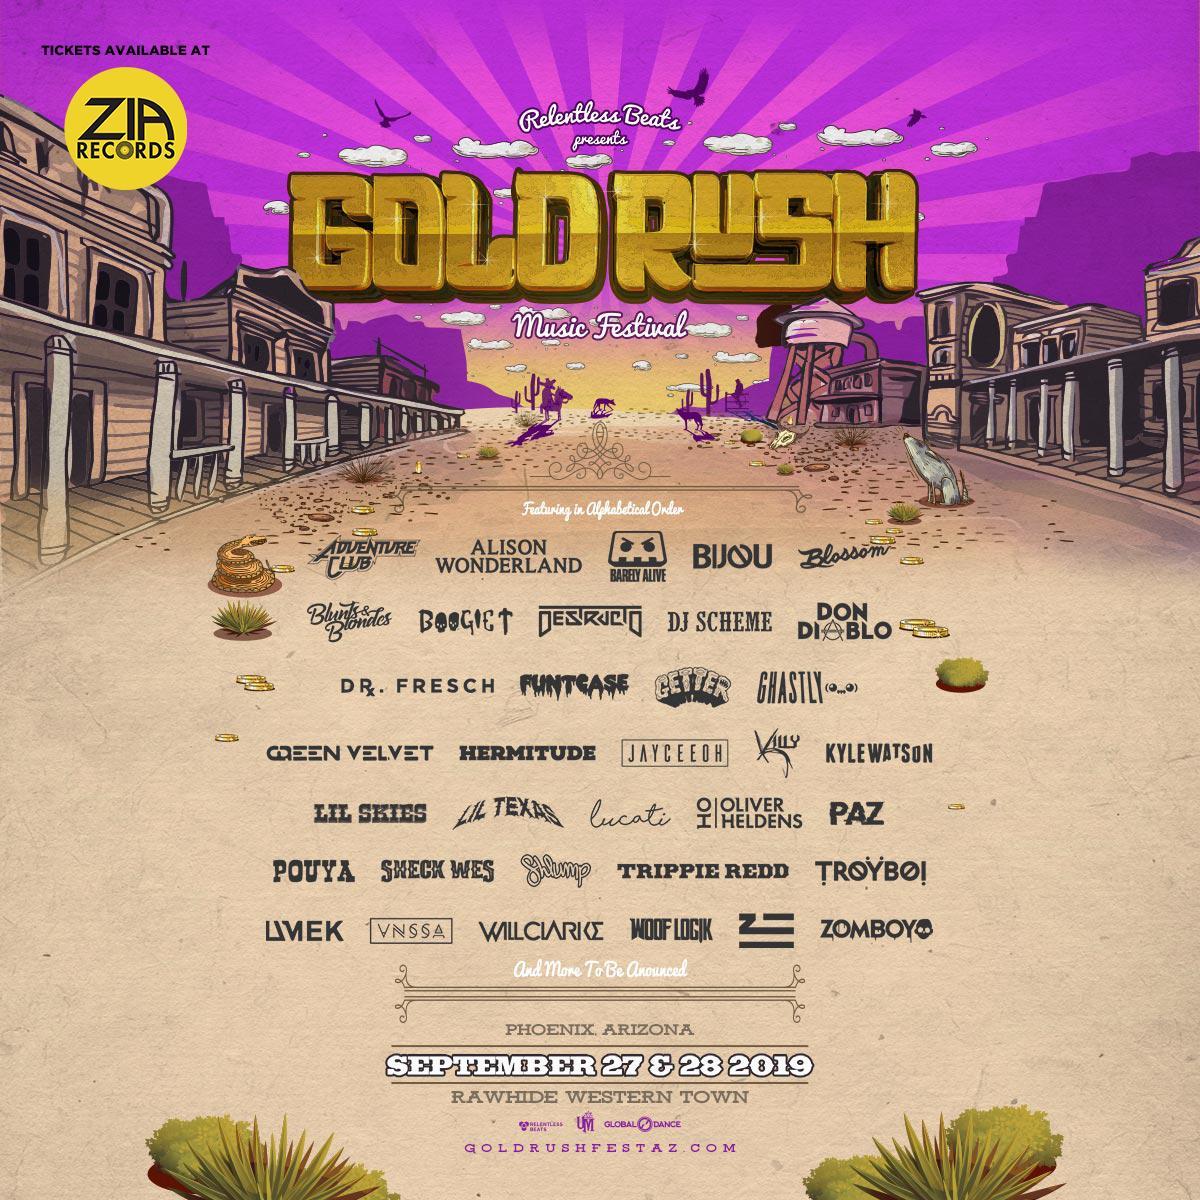 Goldrush Festival lineup